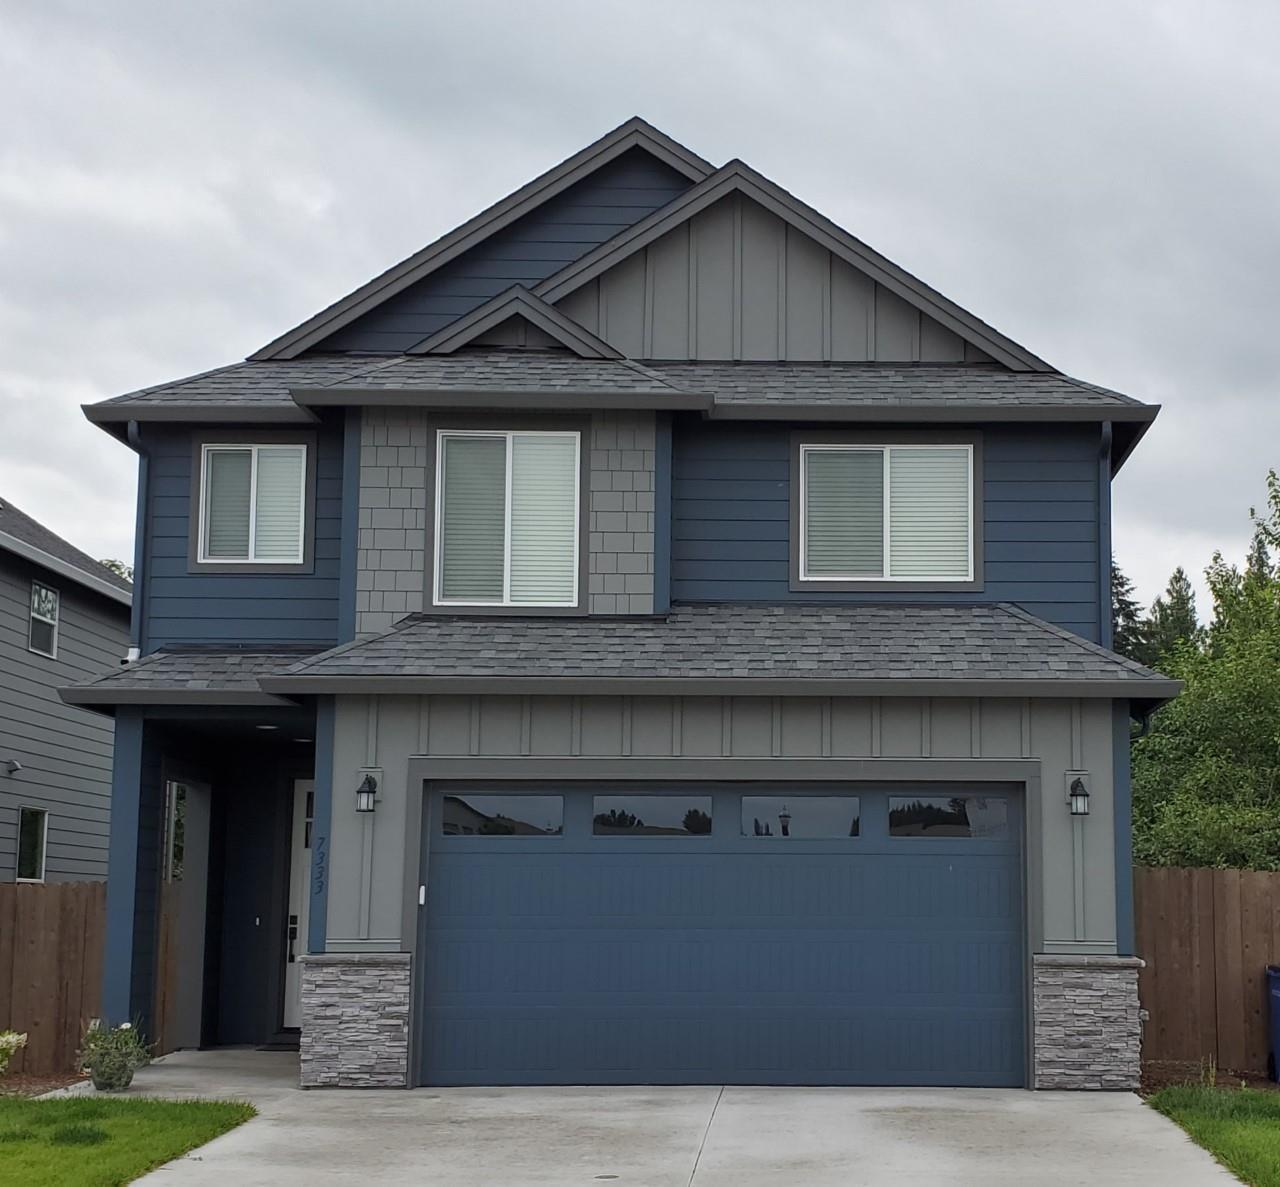 2043 Elevation Photo:Similar Home